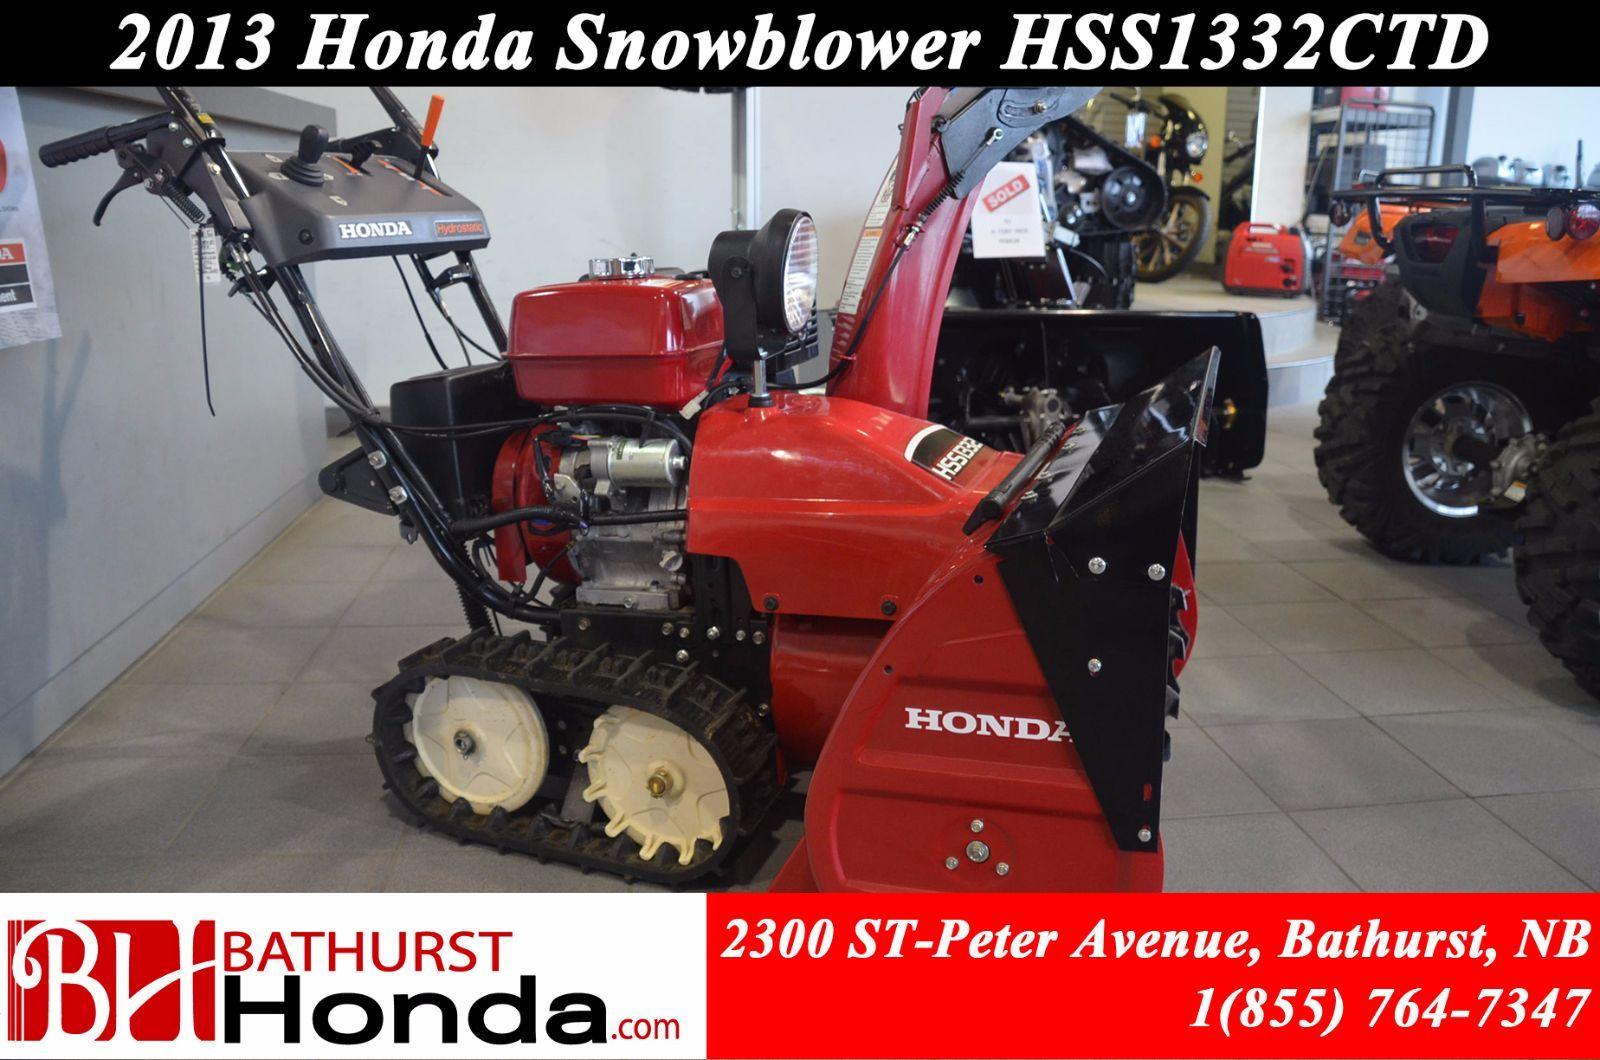 blowers snow snowblowers image snowblower the assist auger of inch es honda